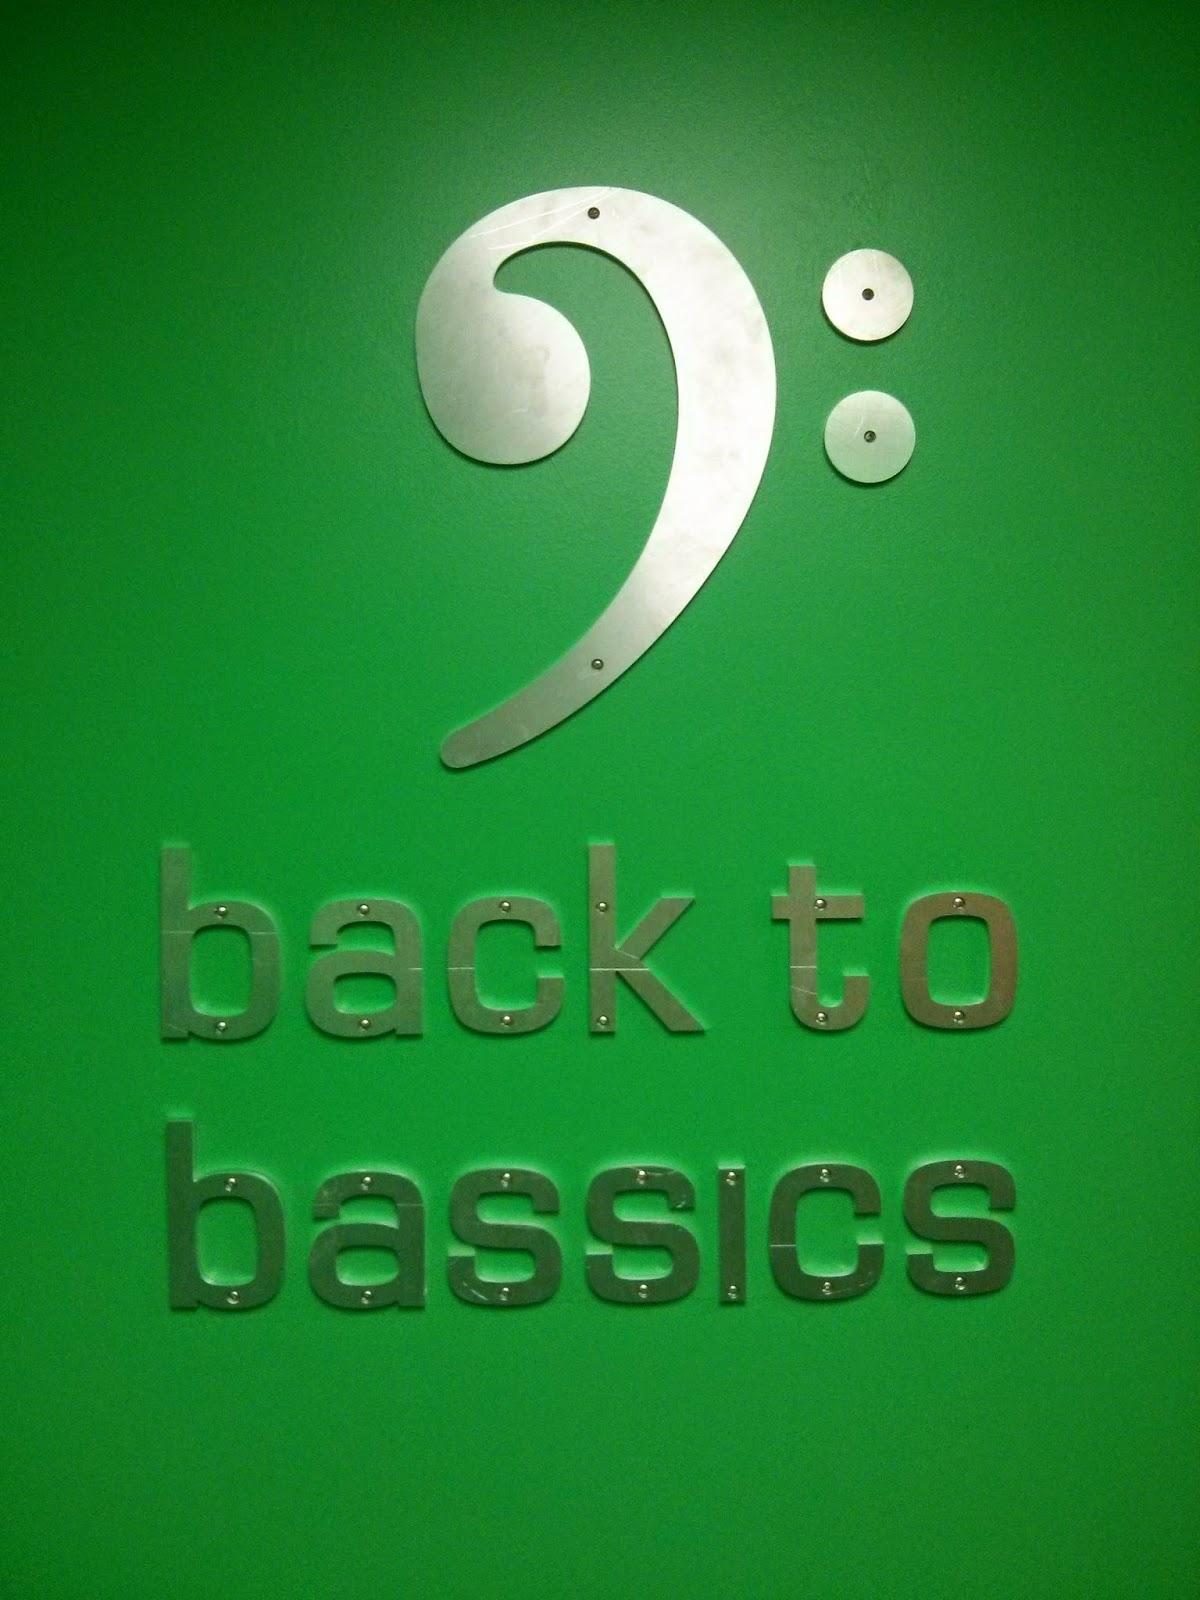 back to bassics, bassics studio, recording studio, bassics recording, back to bassics recording studio, back to bassics studio, steven fies, rob jones, san diego recording studio